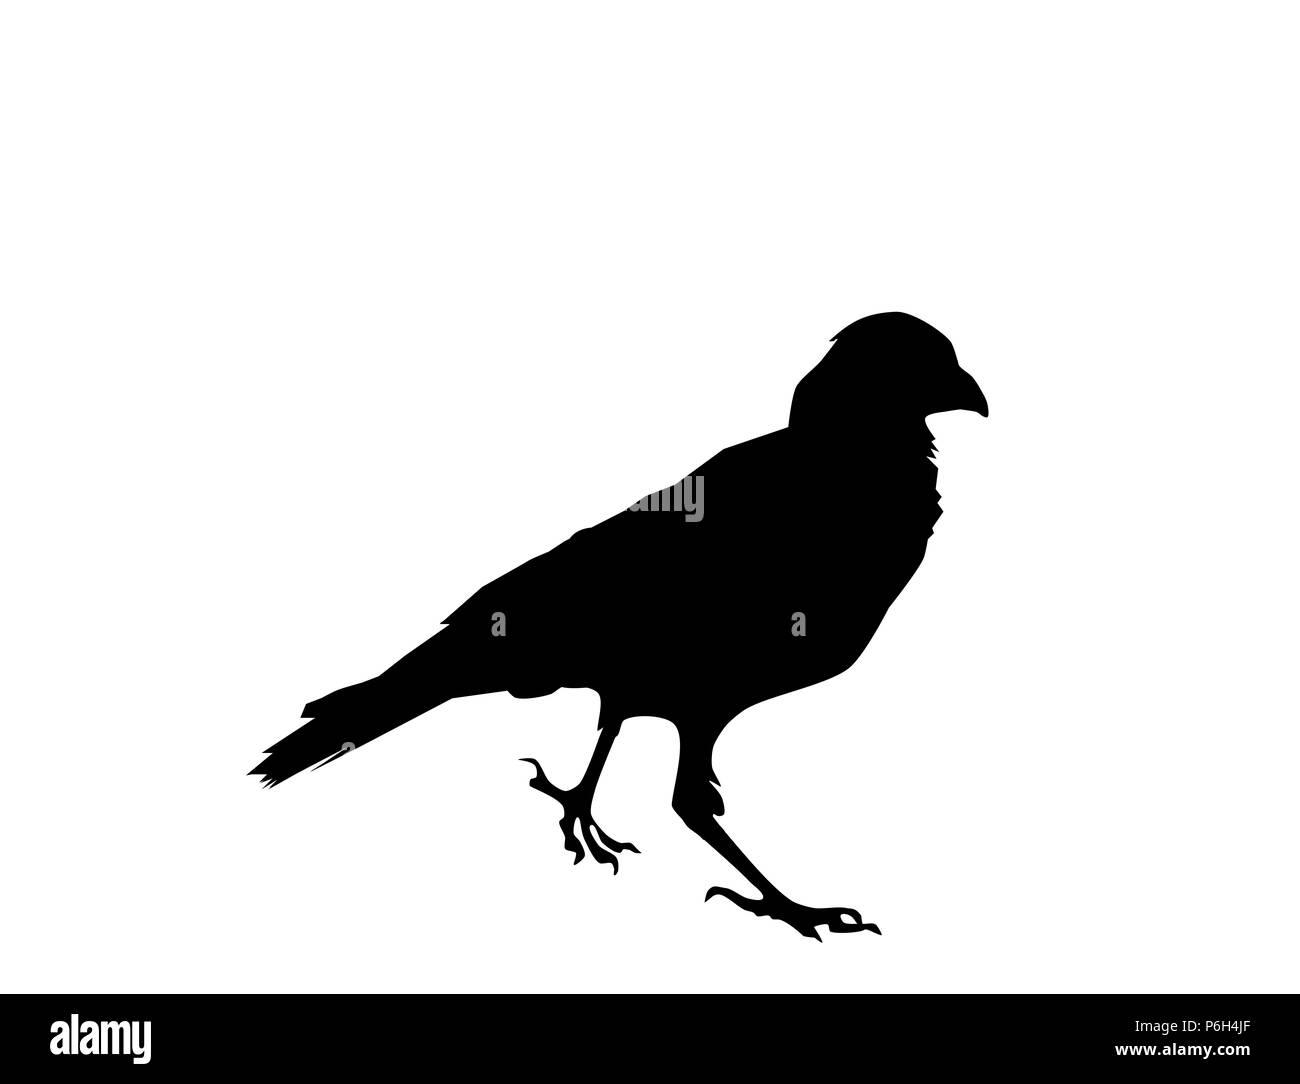 31e3a1c36e3c5 Raven bird black silhouette on white background, vector, eps 10 - Stock  Image